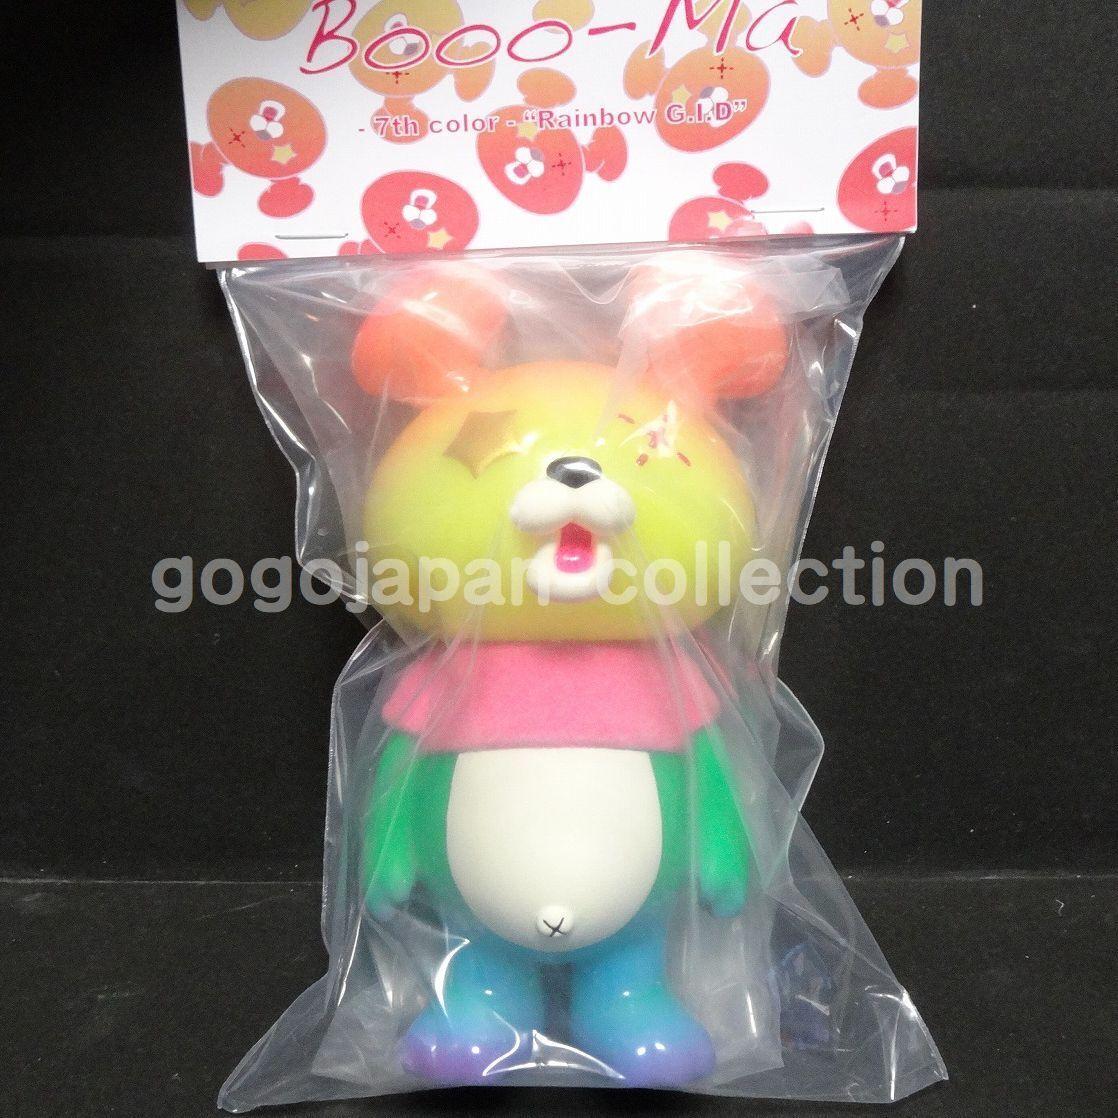 TOKYO COMIC CON 2018 INSTINCTOY Booo-Ma 7th Rainbow G.I.D FIGURE